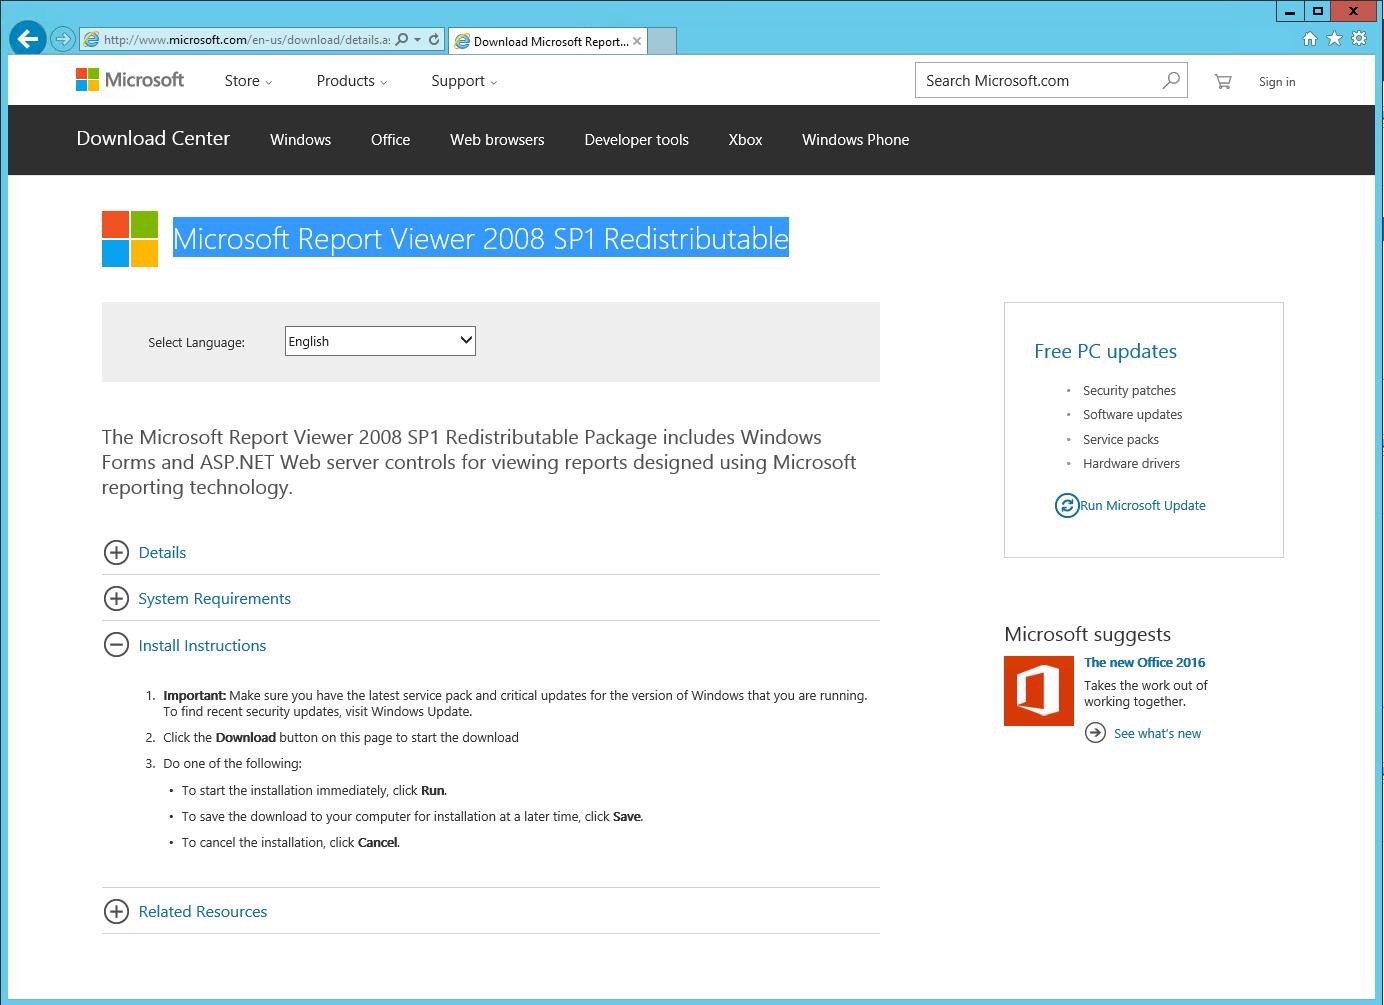 microsoft report viewer 2008 sp1 redistributable downloaden With microsoft viewer redistributable 2008